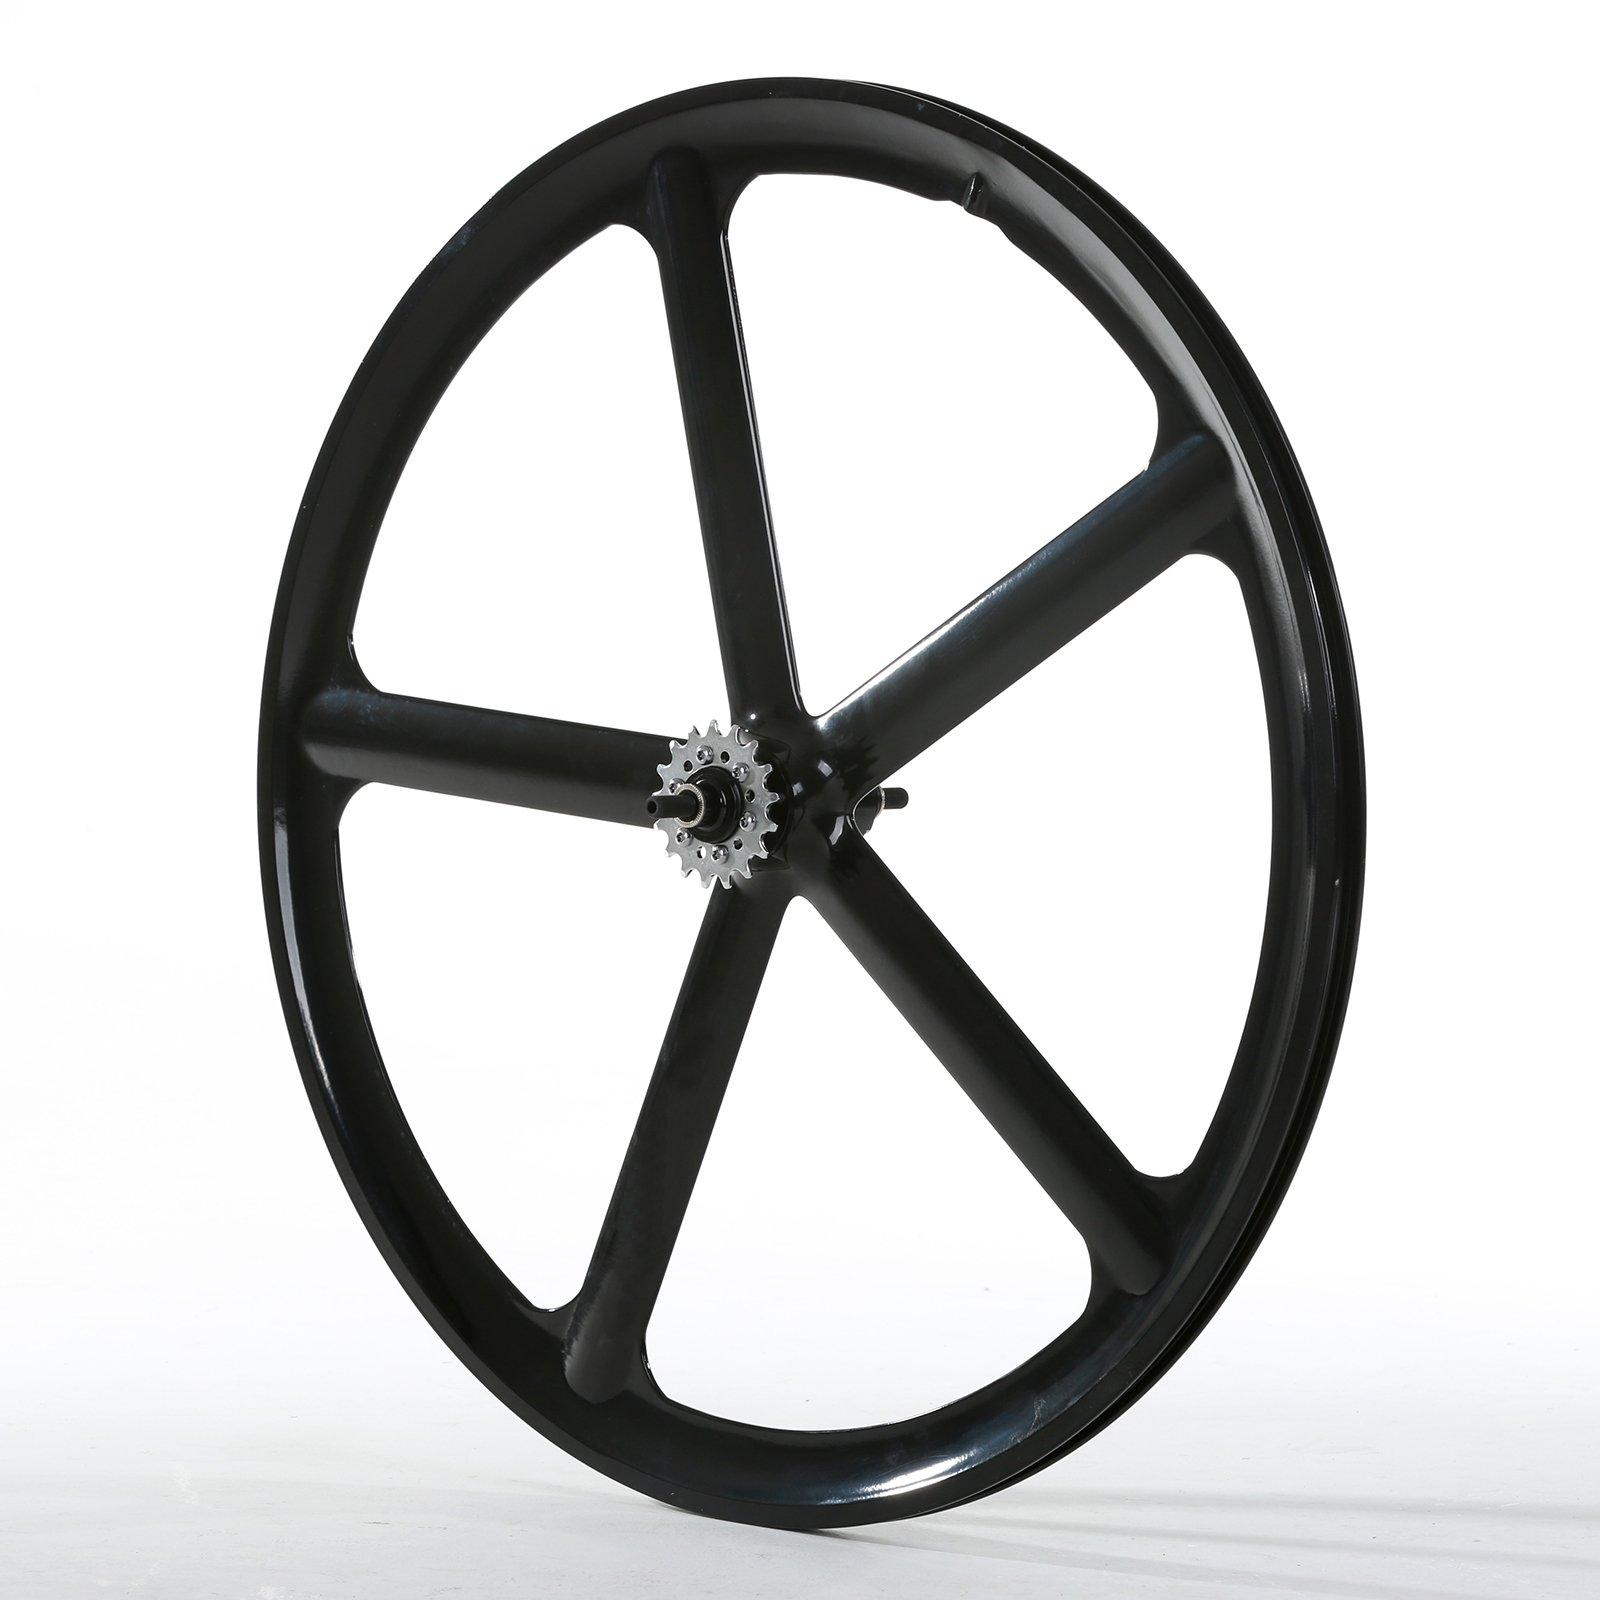 Solomone Cavalli 700c 5 Spoke All-in-one Rear Bicycle Wheel for Fixie Fixed Gear Road Single Speed by Solomone Cavalli